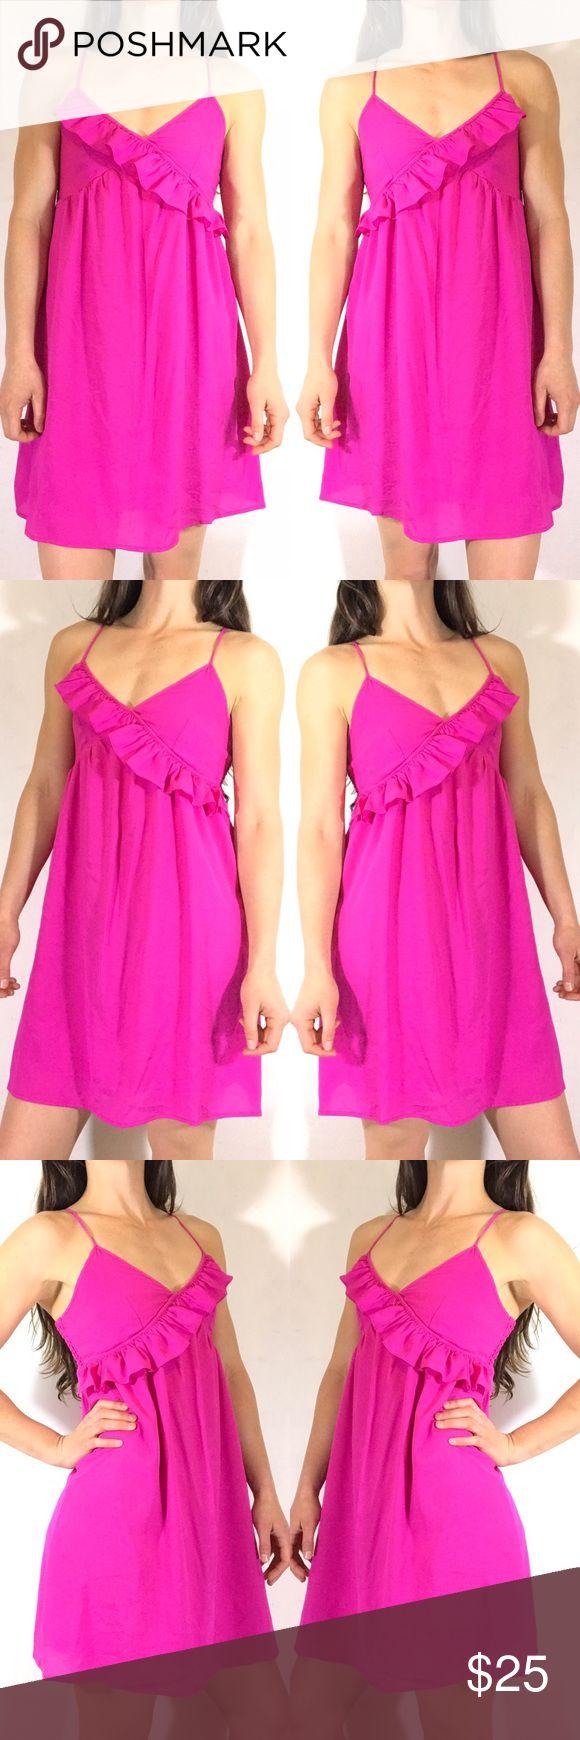 FOREVER 21 HOT PINK DRESS Cute hot pink dress. Forever 21 Dresses Mini